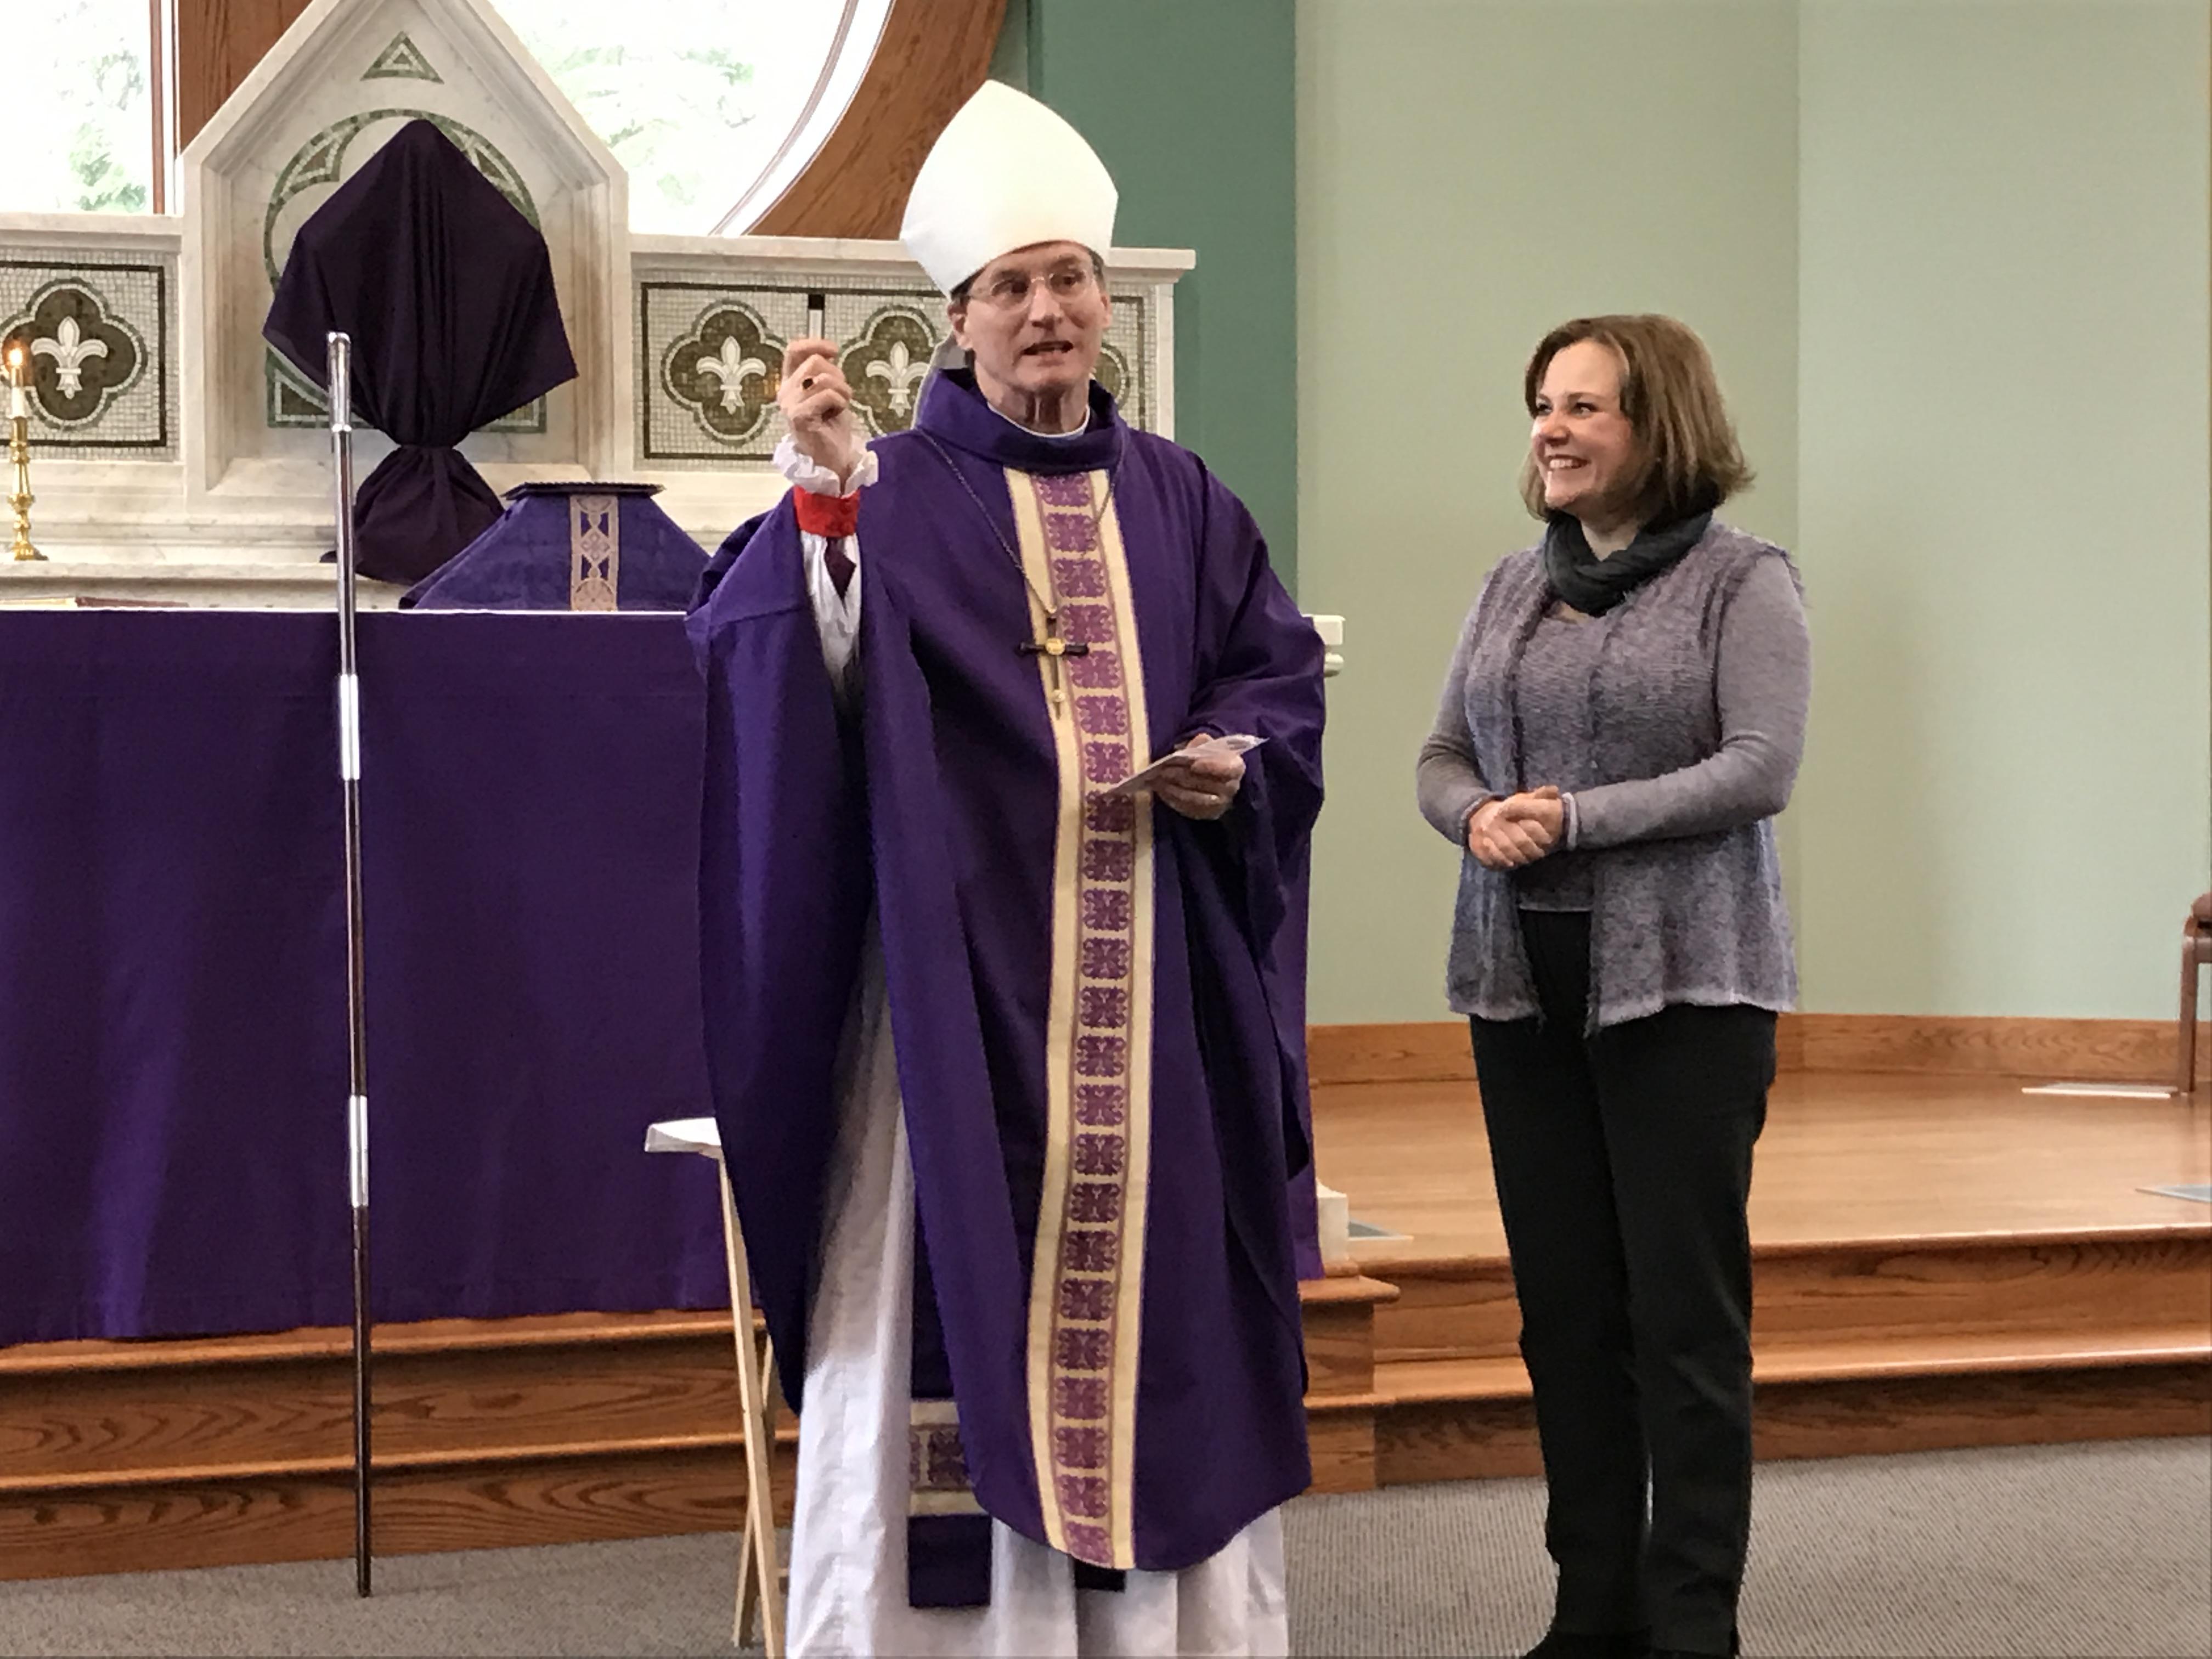 Evangelism Conf 2017 - Bishop and Carrie